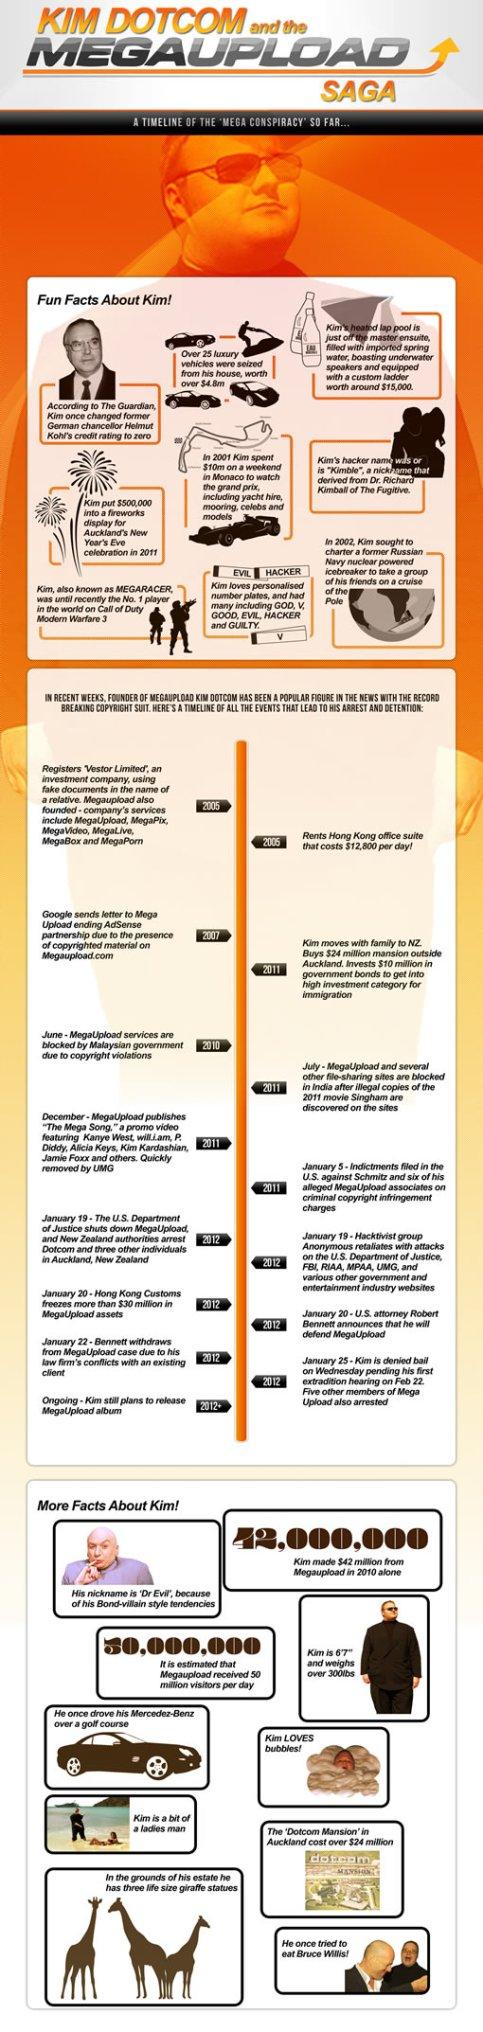 Kim-Dotcom-Megaupload-infographic